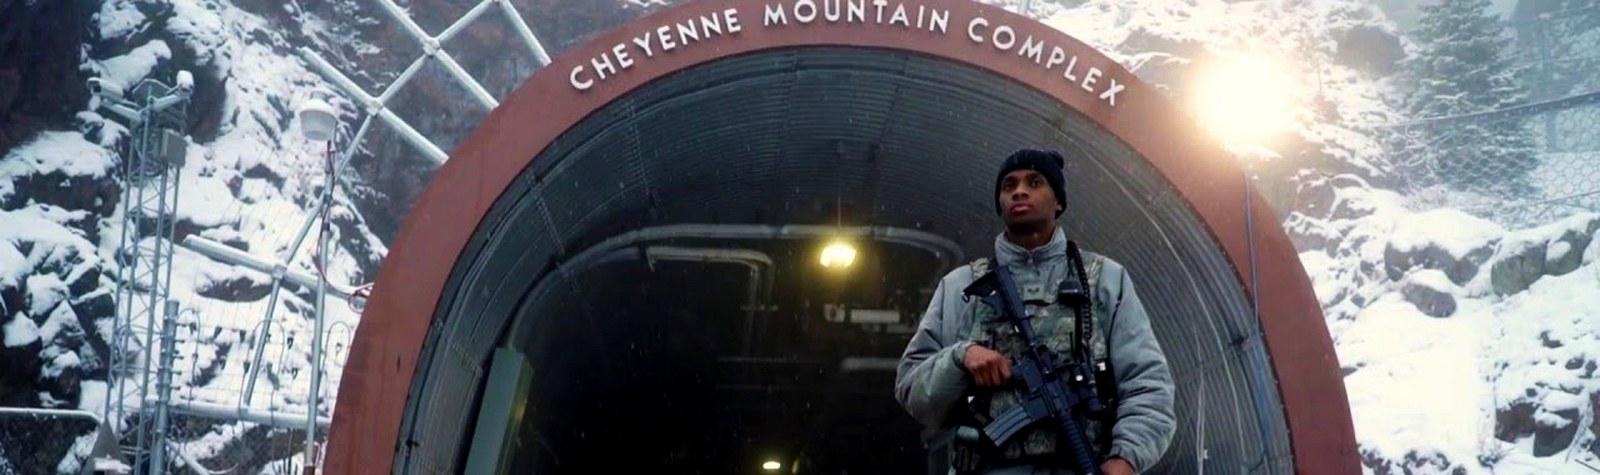 cheyenne-mountain-1